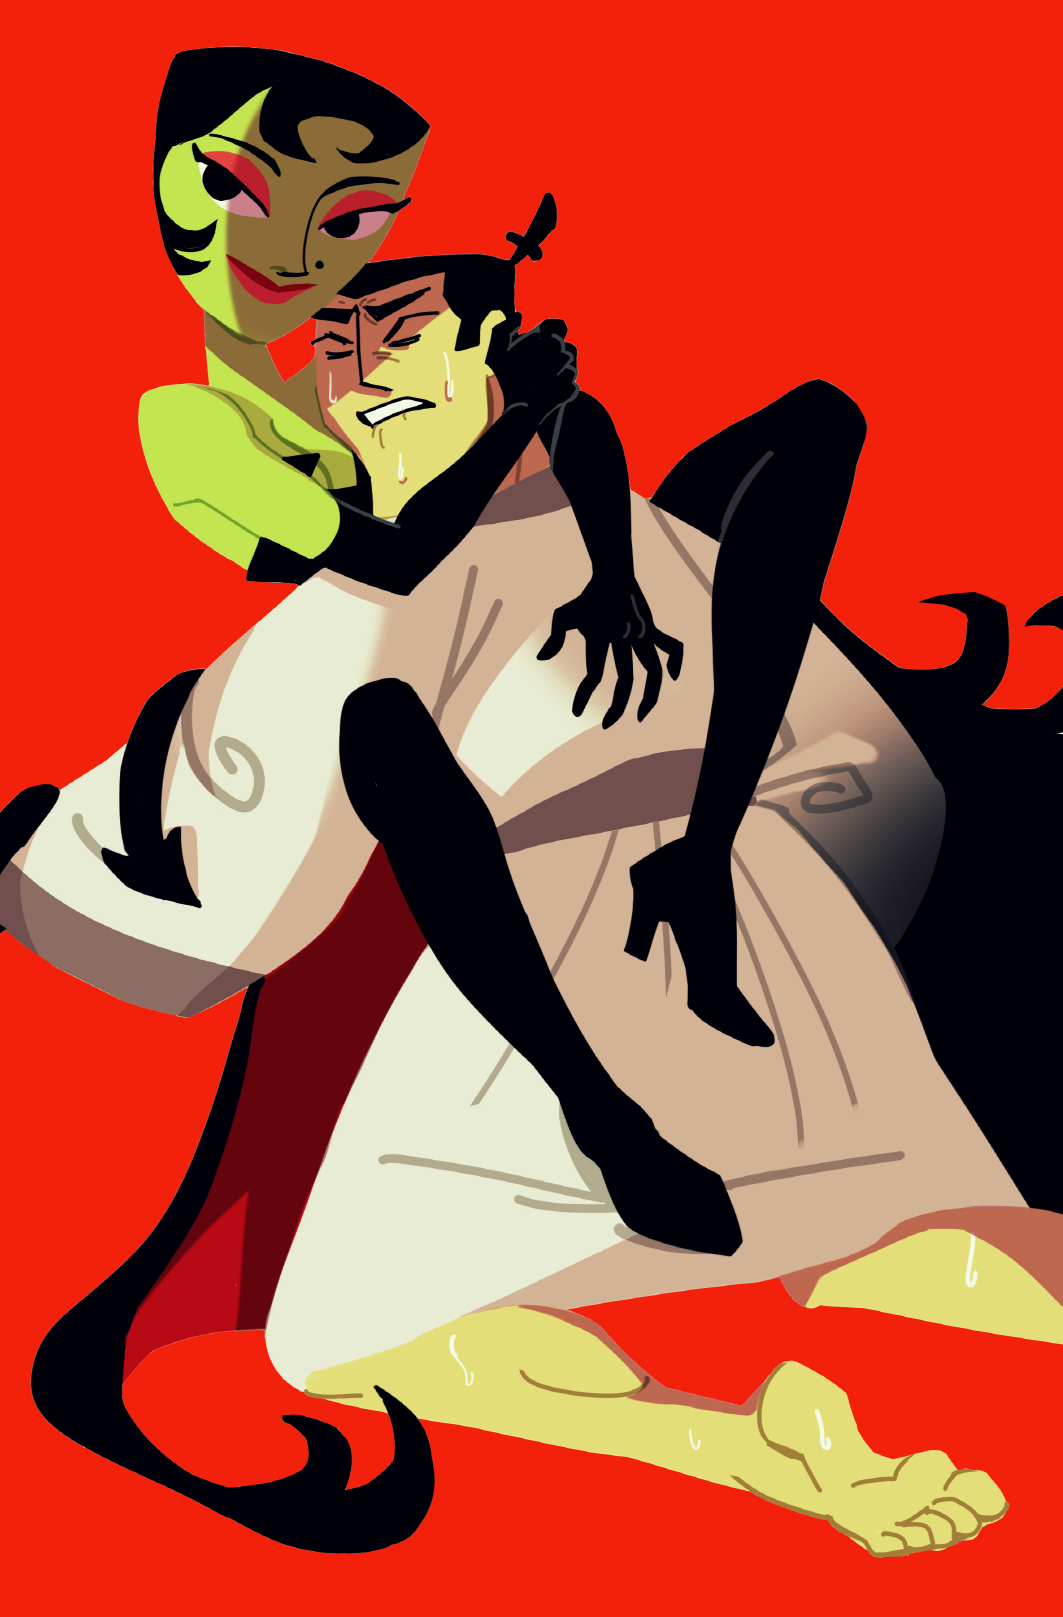 HD Quality Wallpaper   Collection: Cartoon, 1063x1617 Samurai Jack